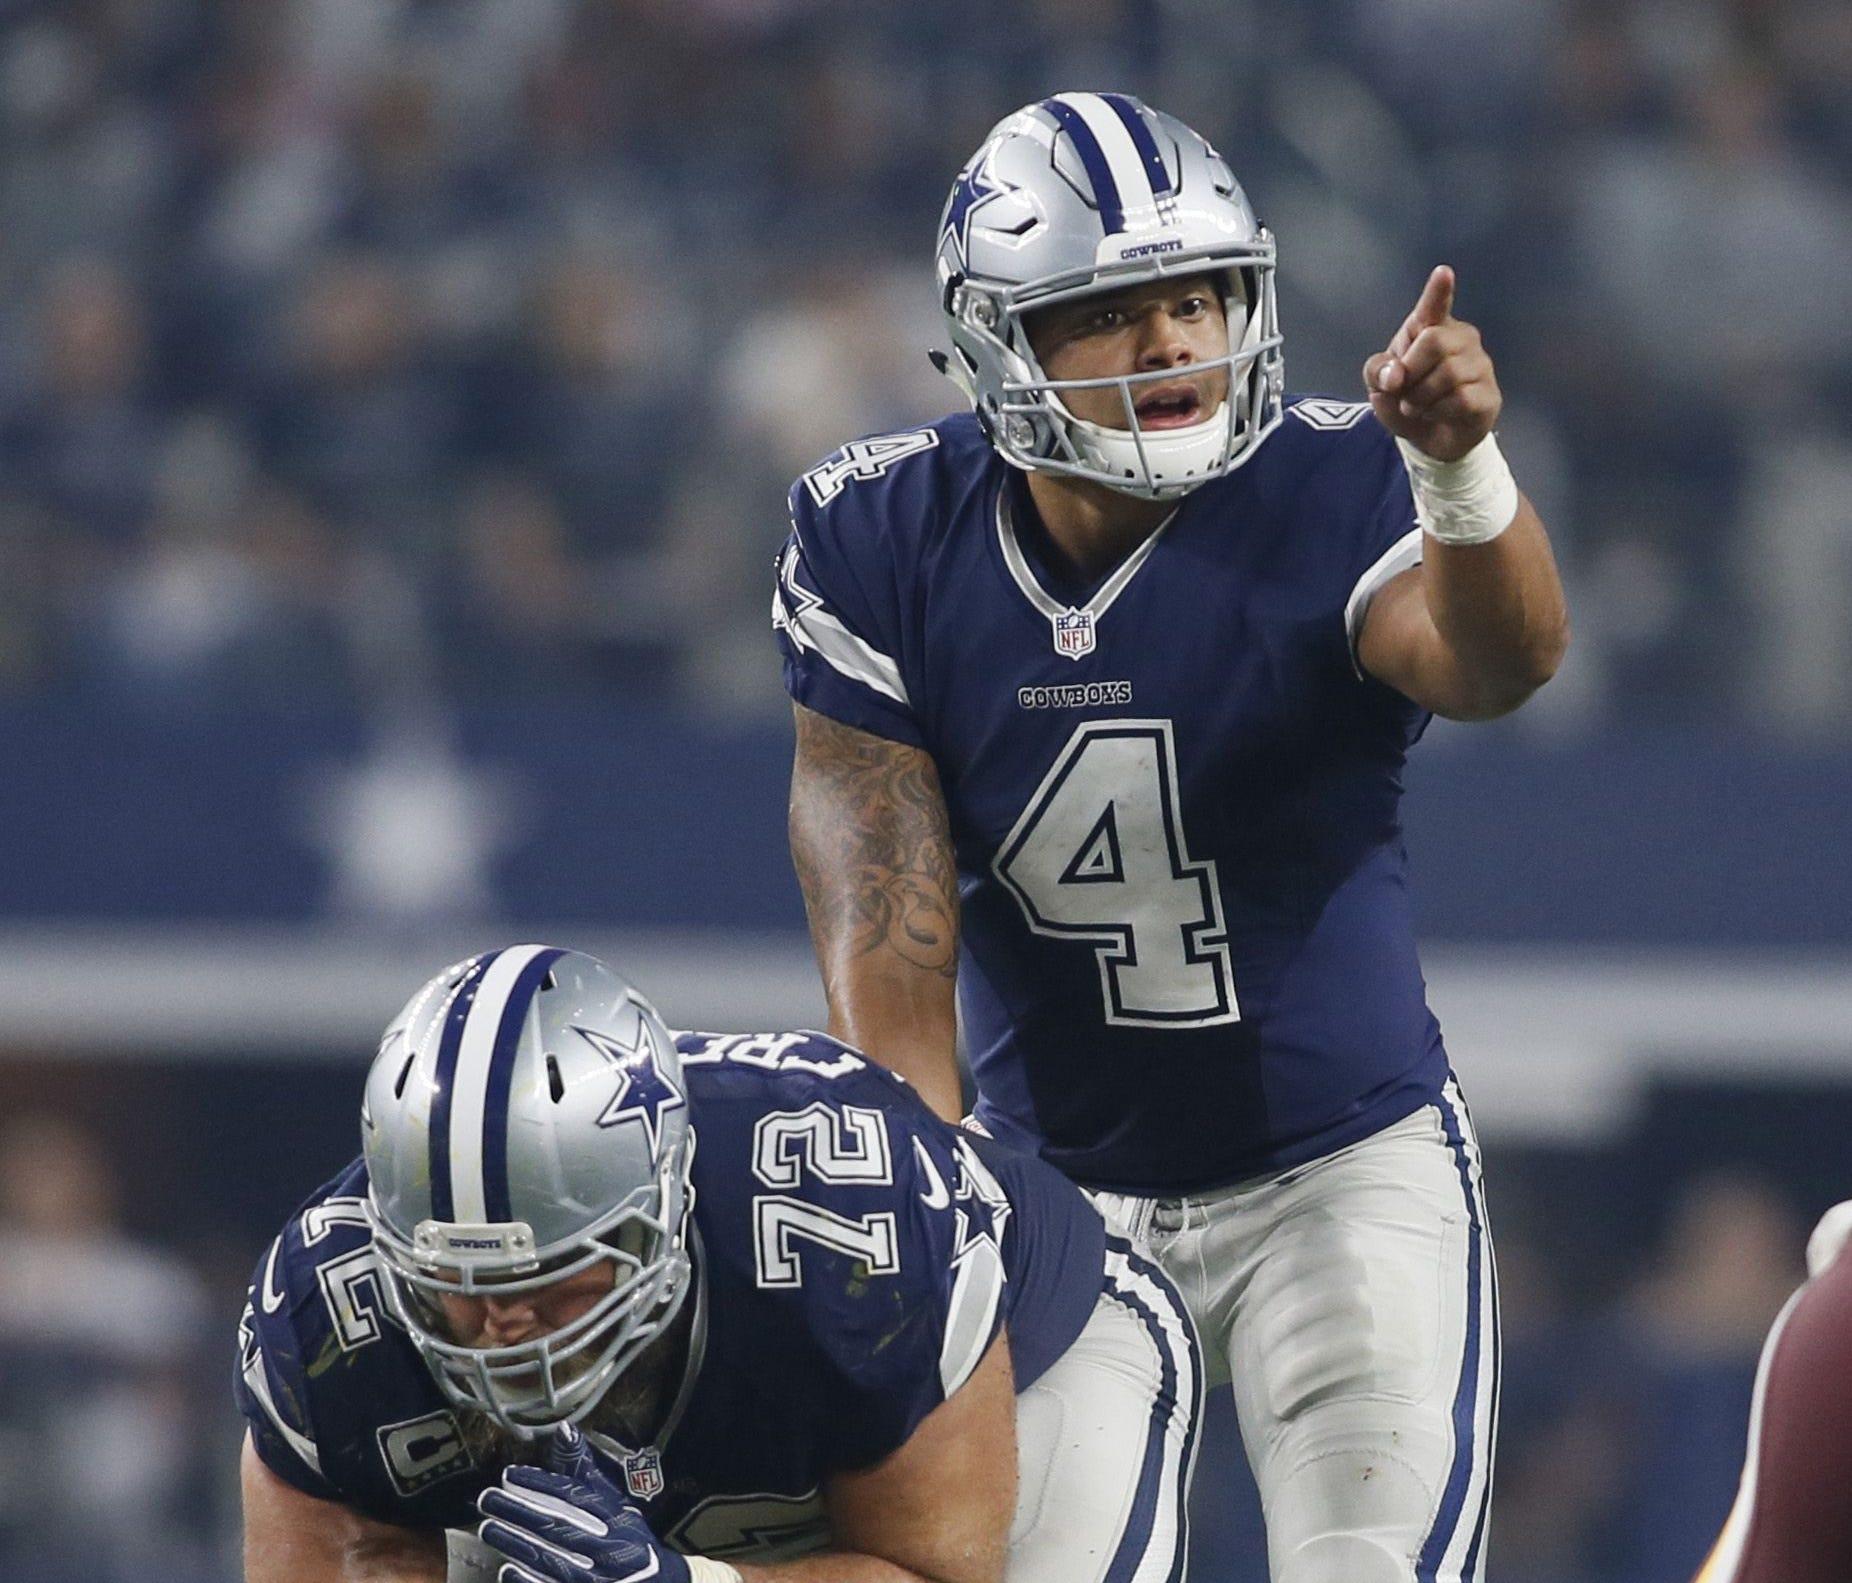 Dallas Cowboys quarterback Dak Prescott (4) calls a play in the fourth quarter against the Washington Redskins at AT&T Stadium.